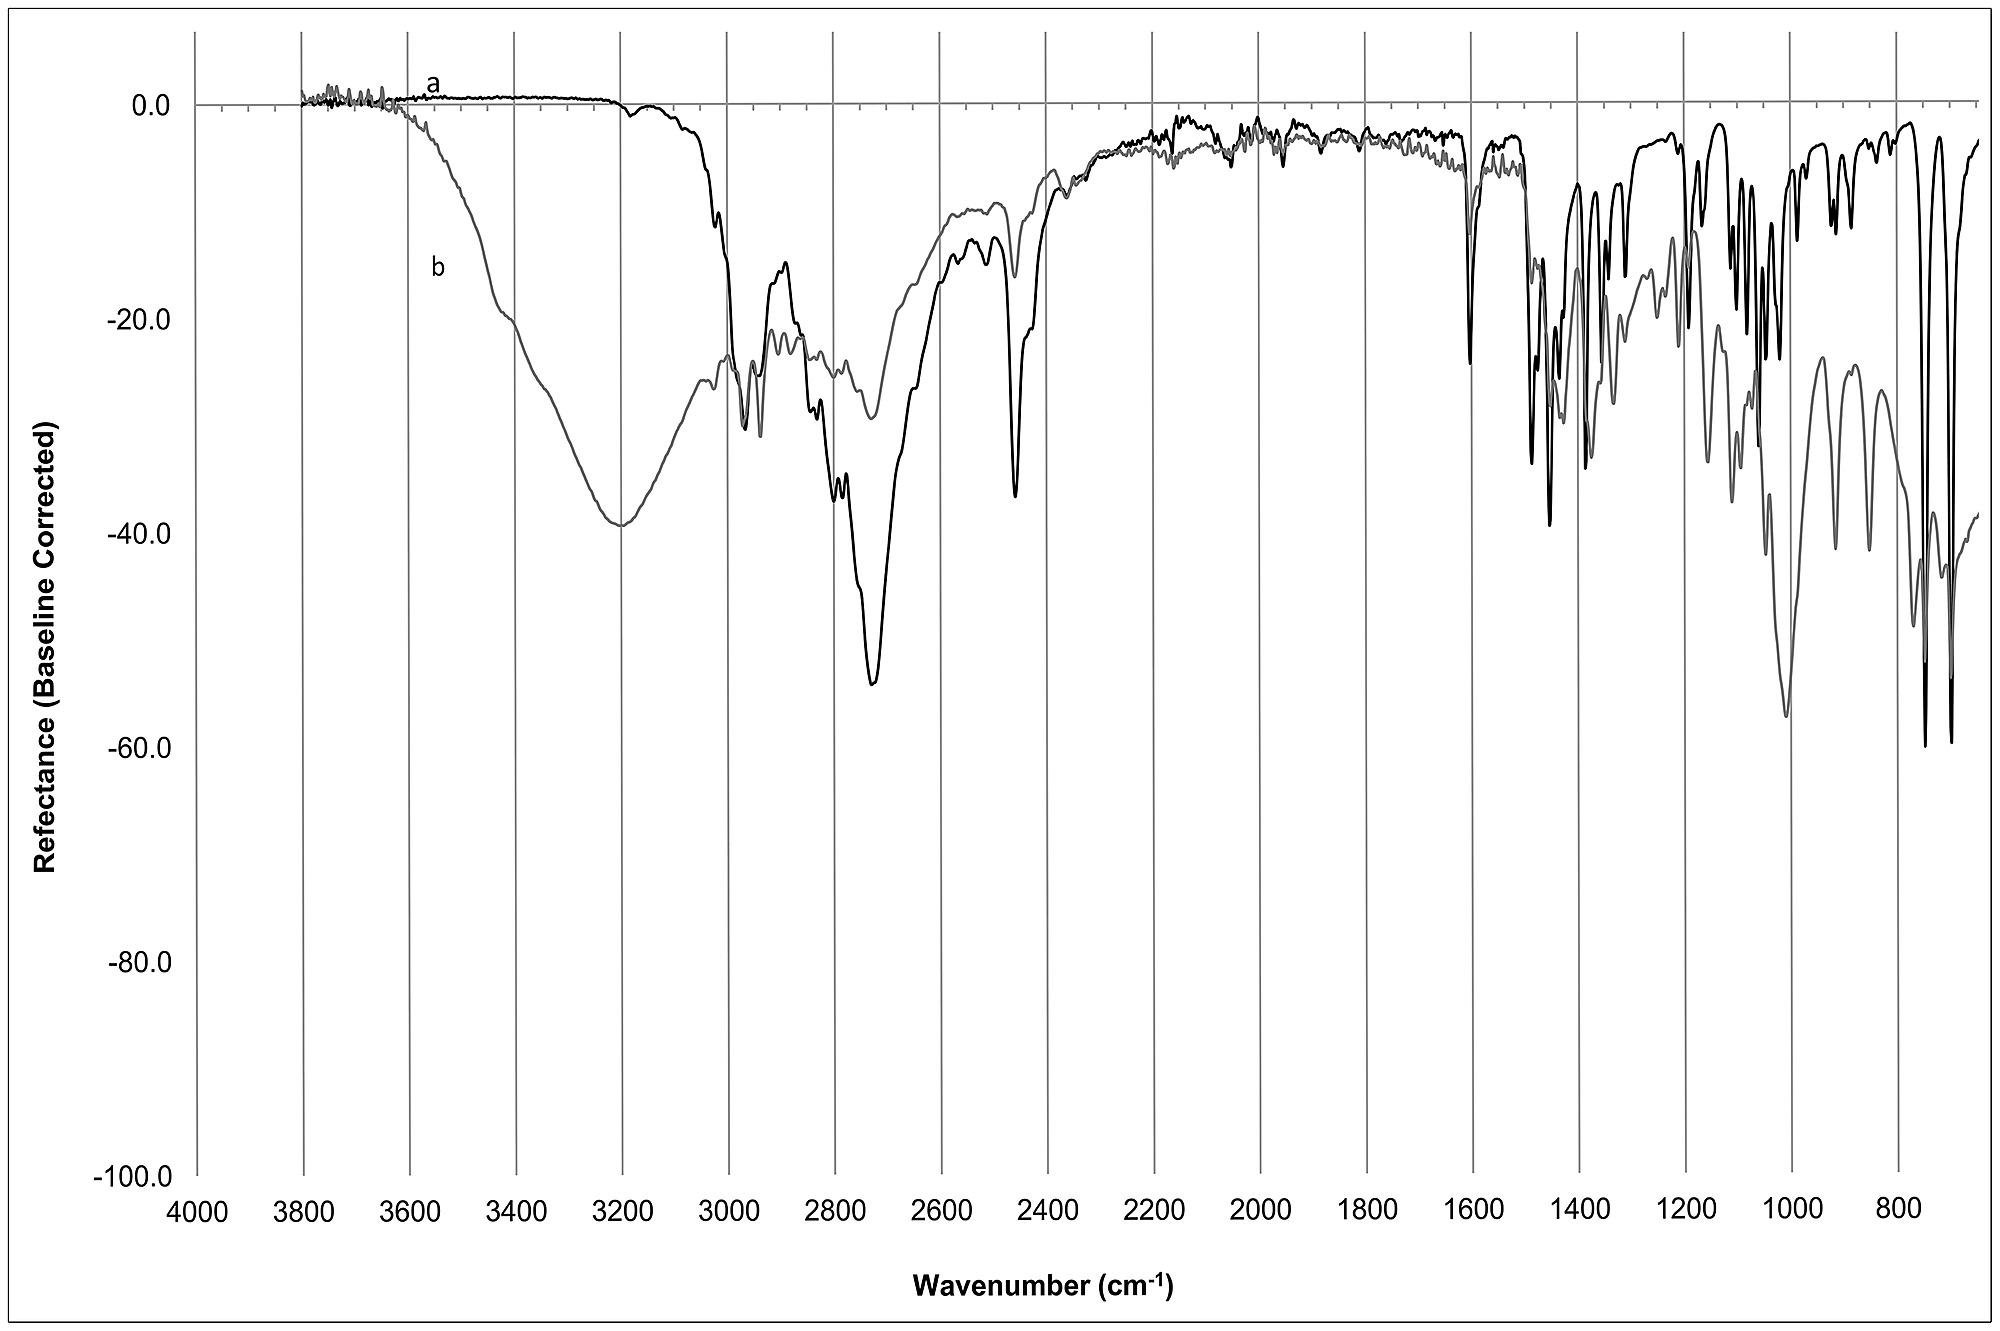 Typical ATR-FTIR spectra of Methamphetamine, a) High